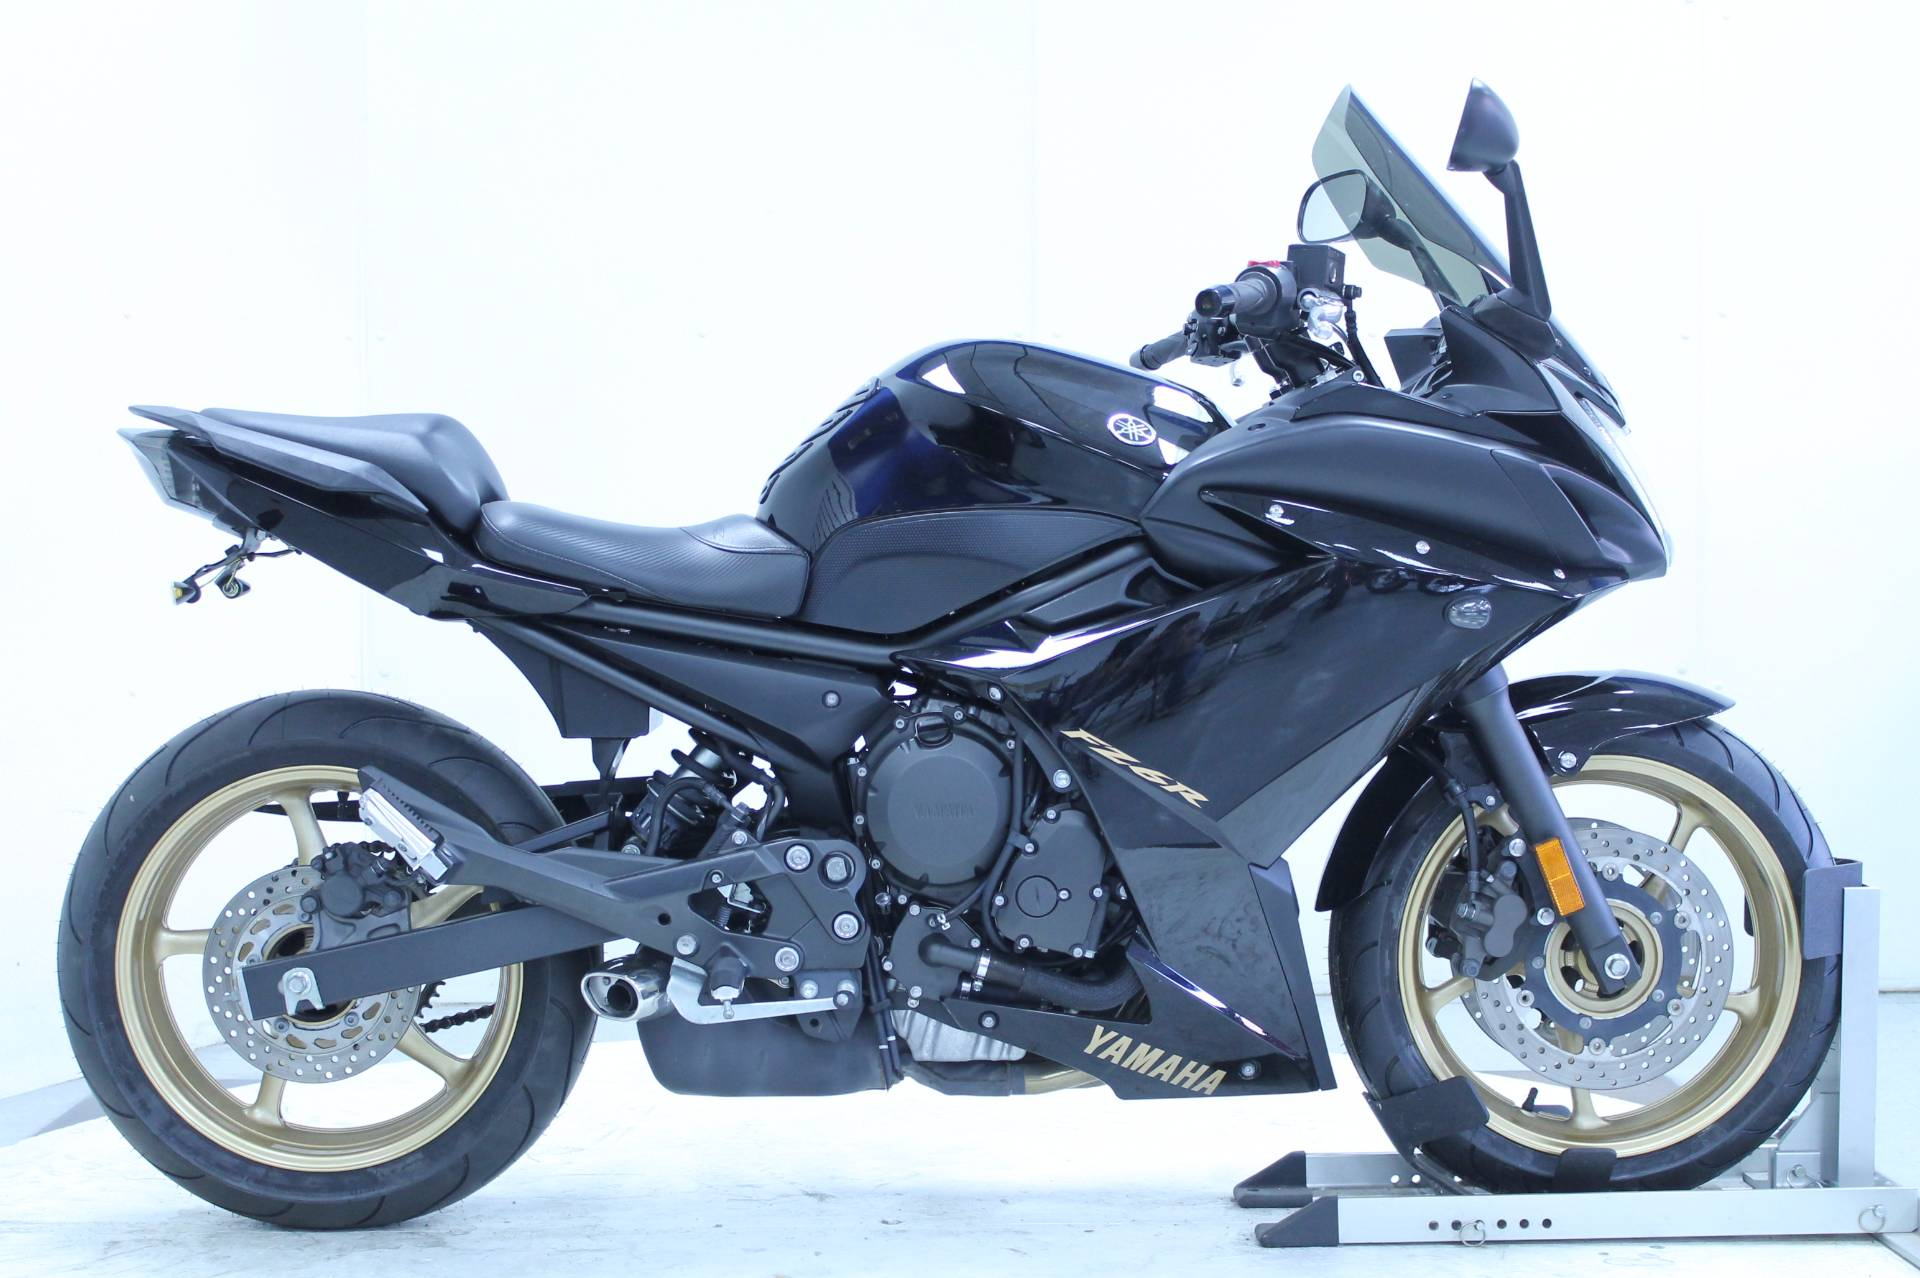 2010 yamaha fz6r for sale for Yamaha dealers in mass